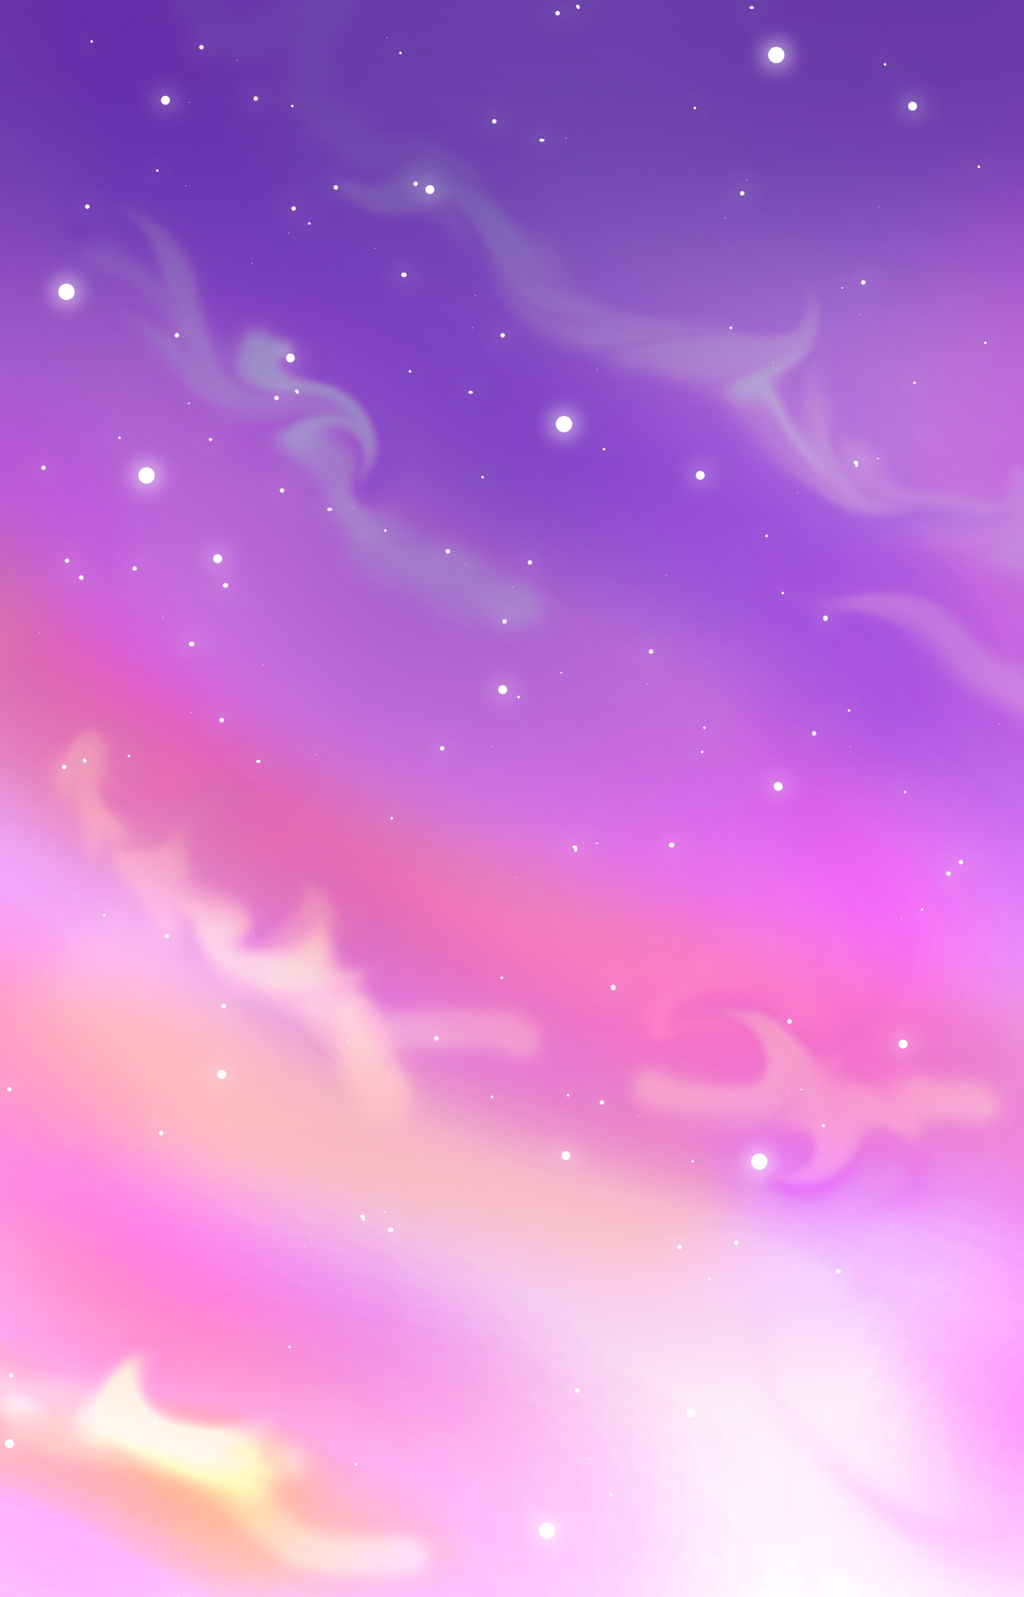 starry sky wallpaper tumblr - photo #28